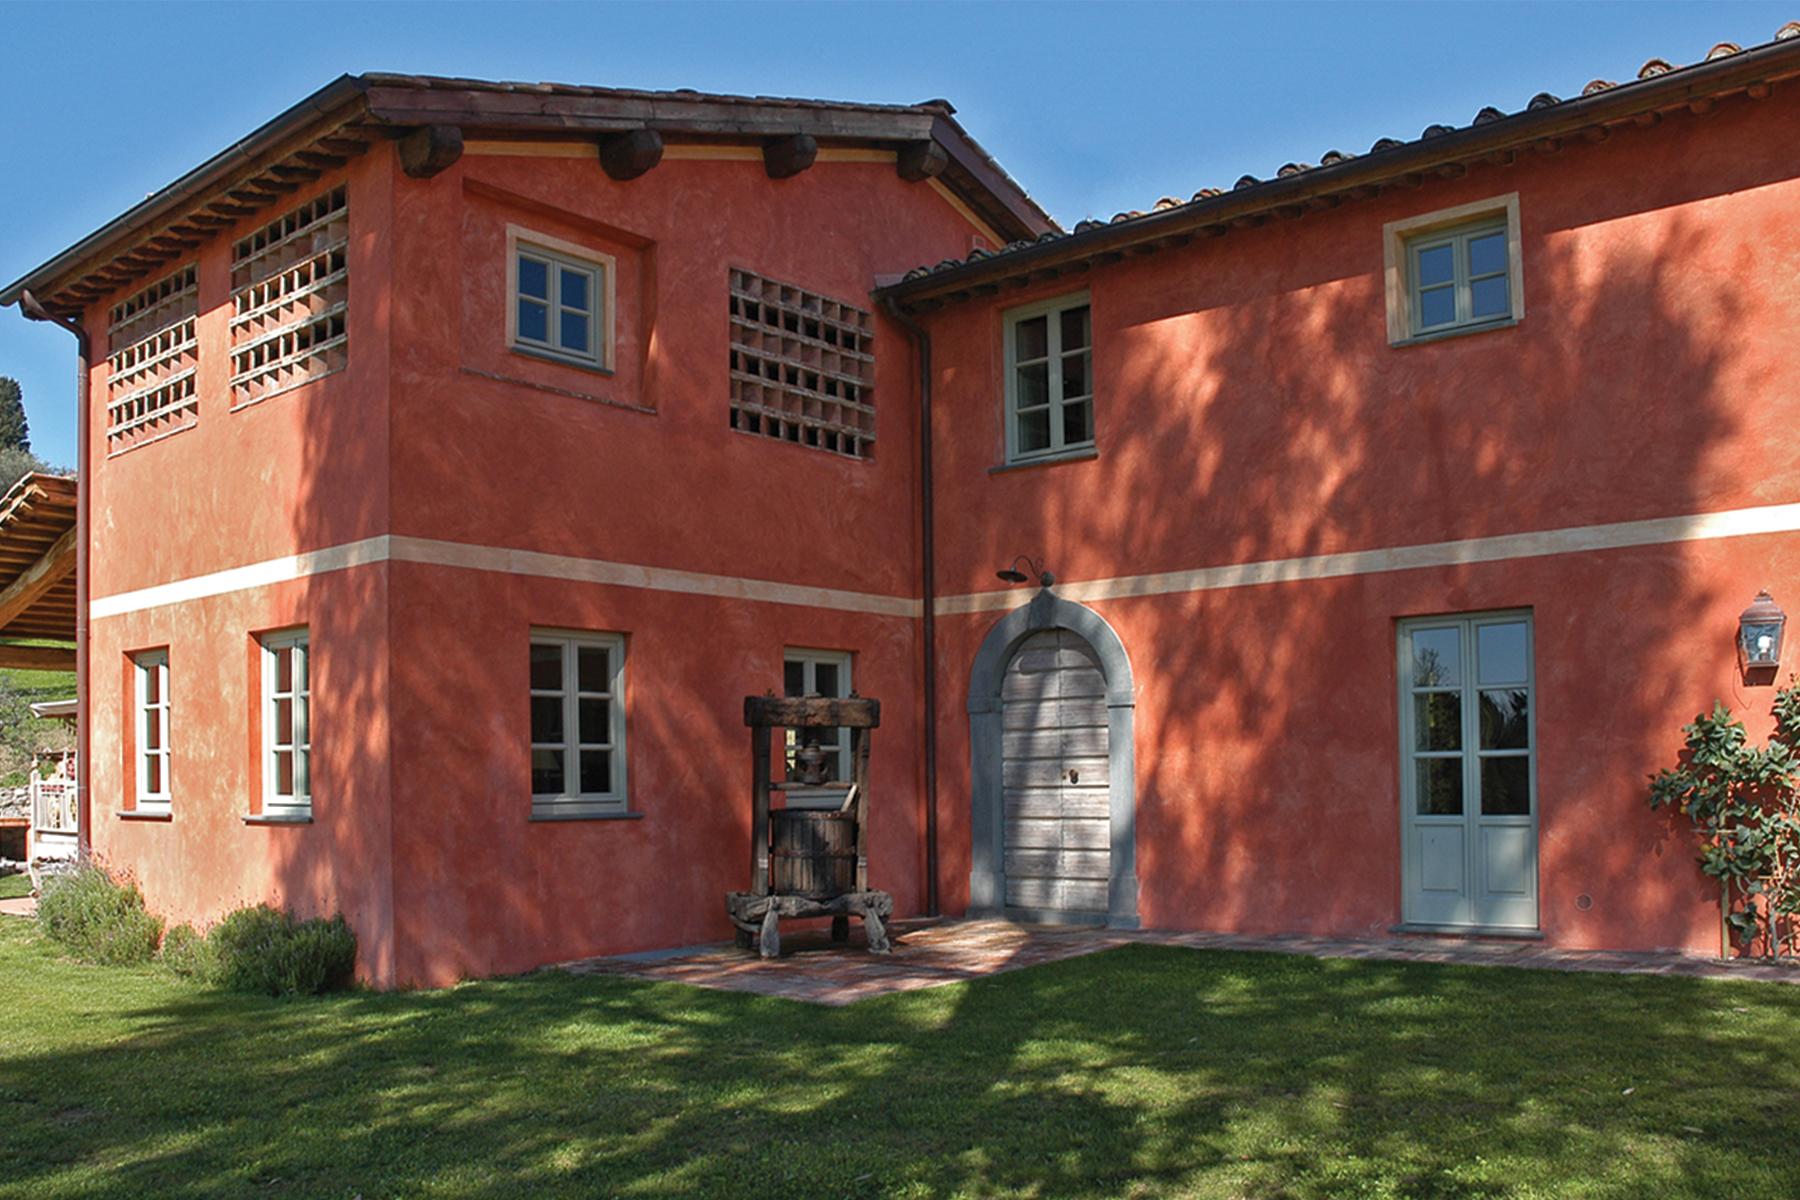 Casa indipendente in Vendita a Massarosa: 5 locali, 350 mq - Foto 2